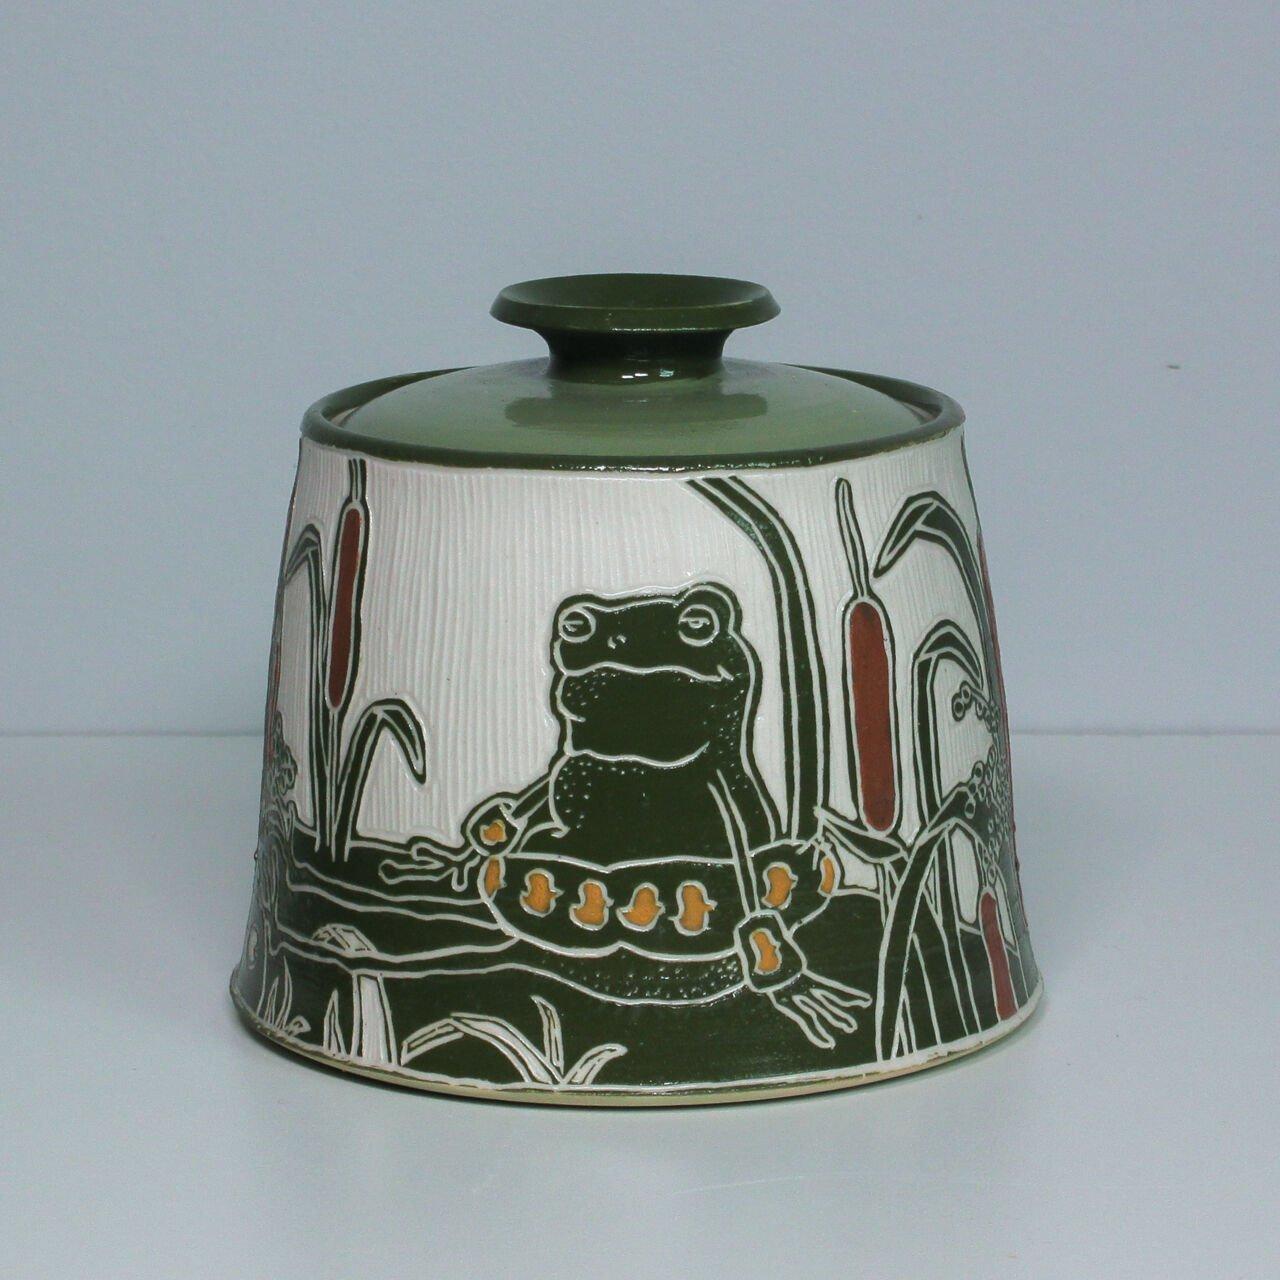 Ceramic work by Sarah Anderson